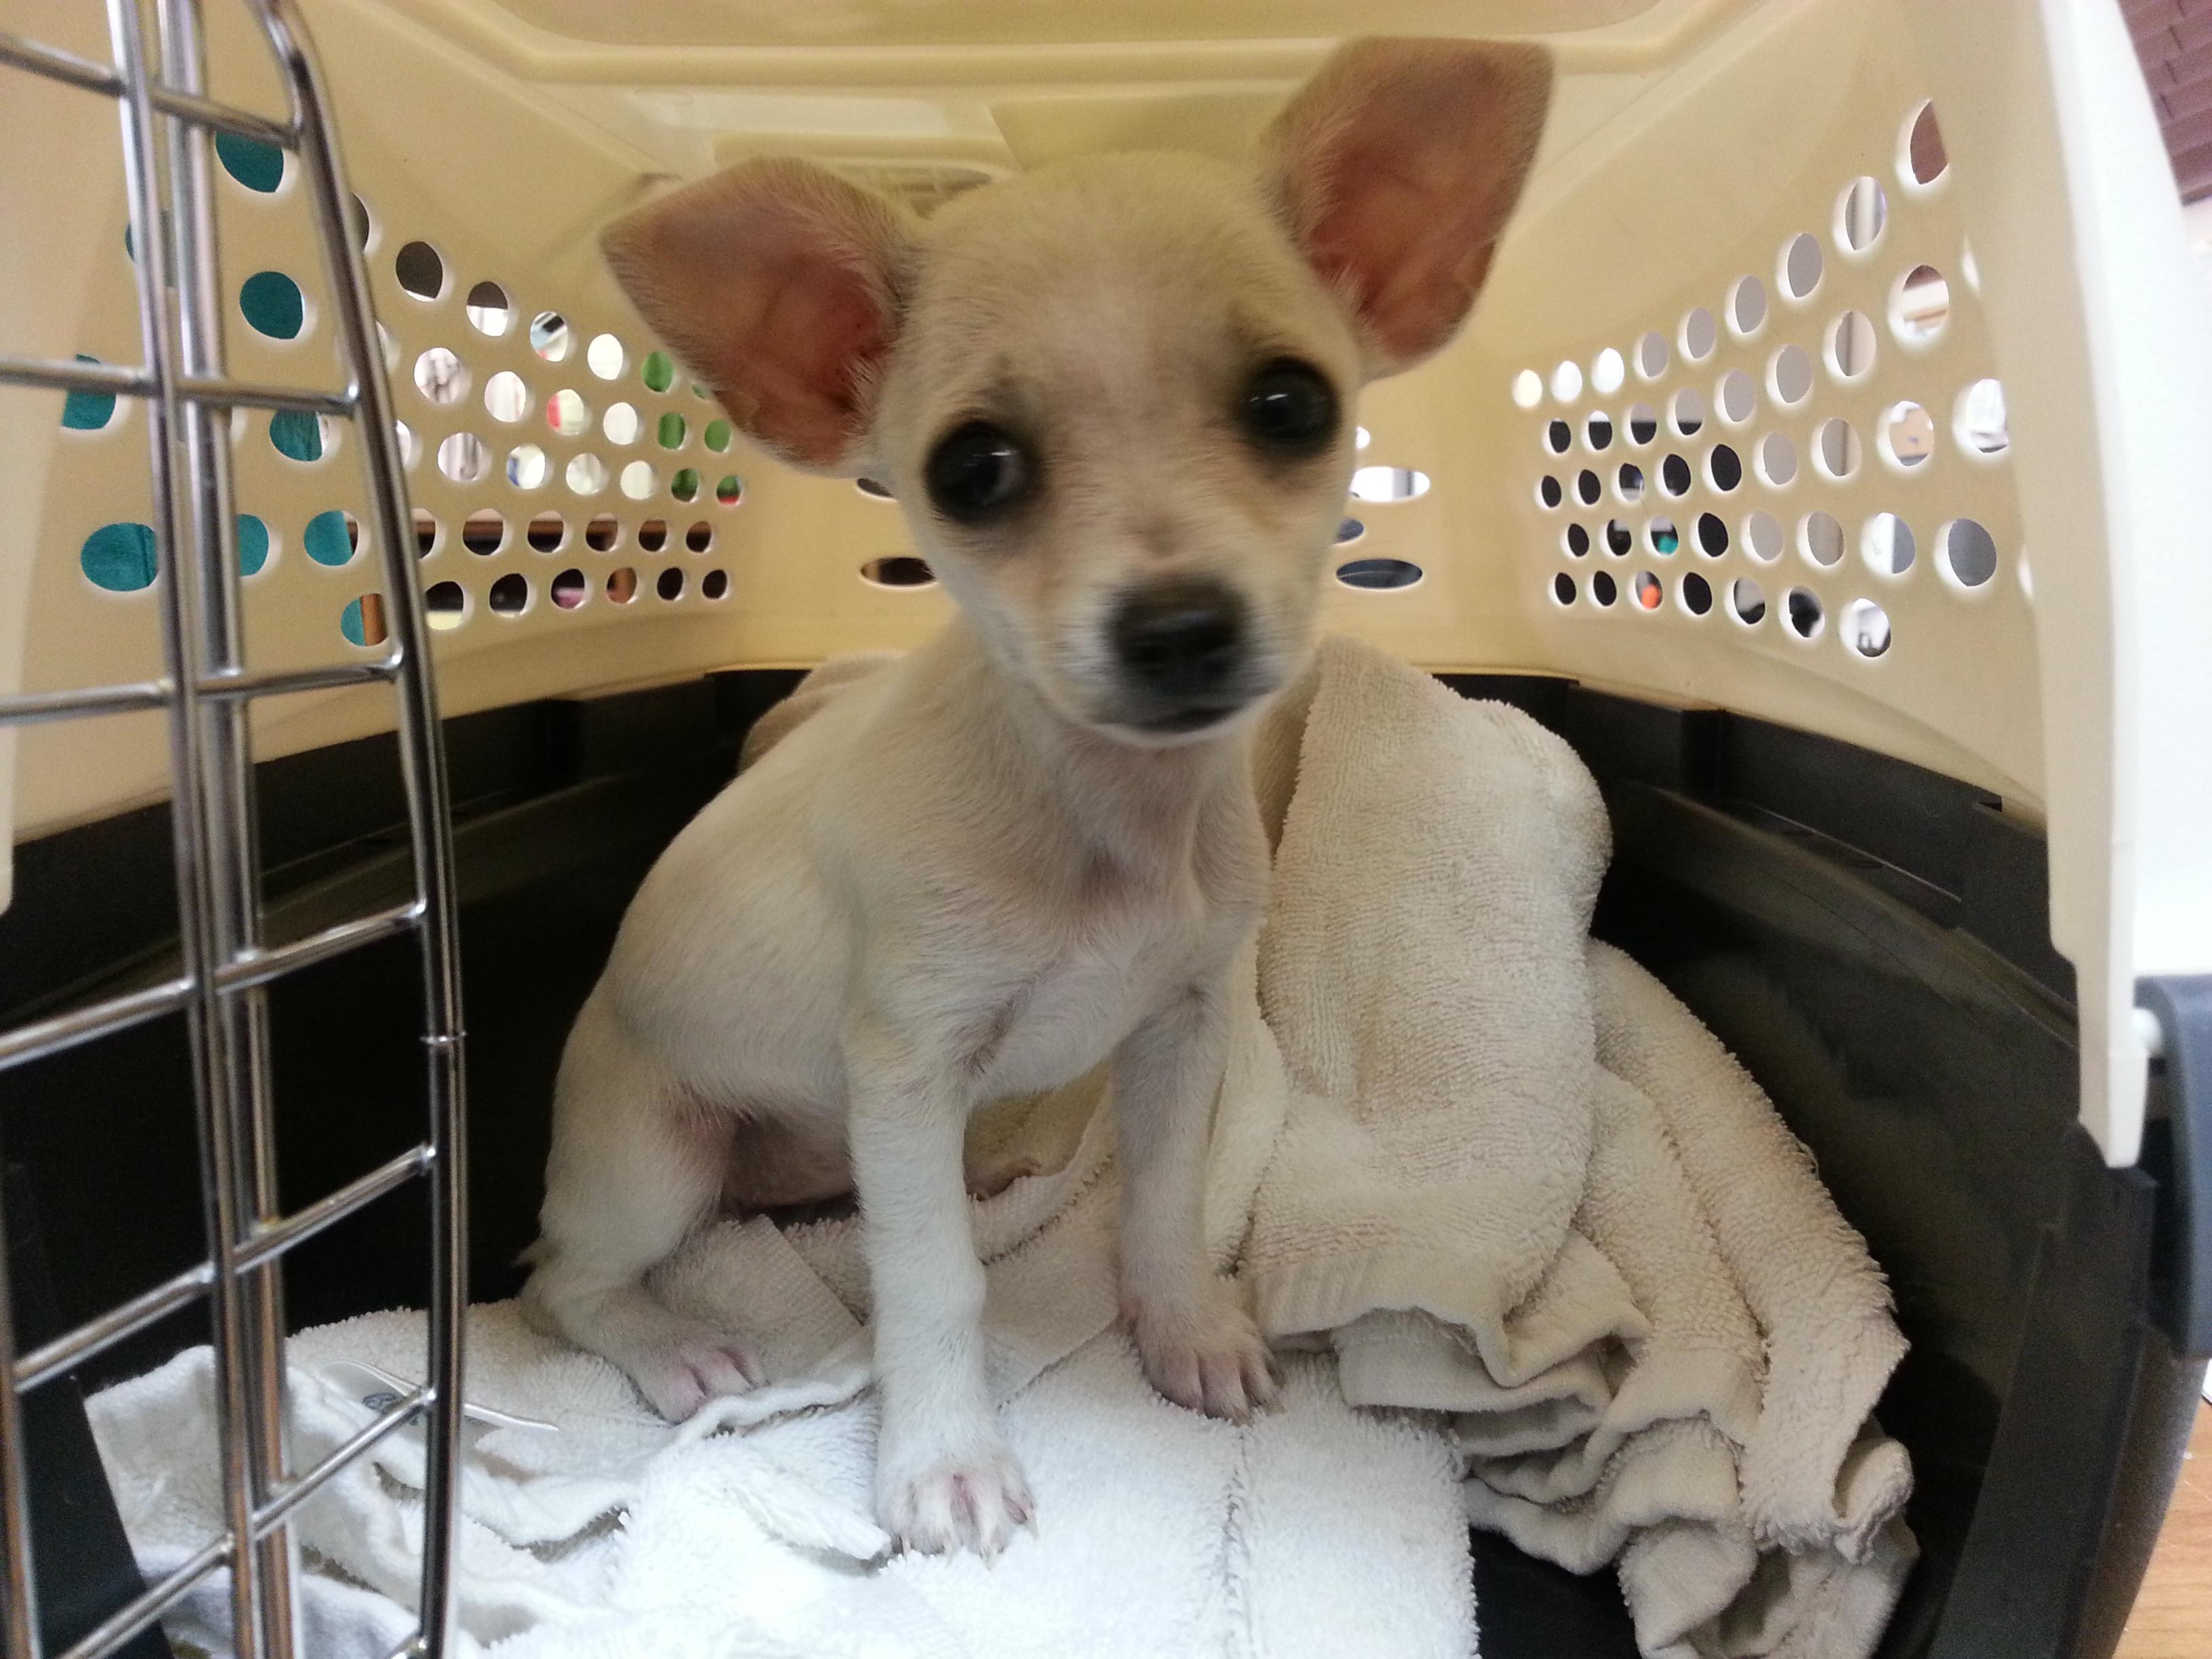 White Chihuahua Puppy 2 months